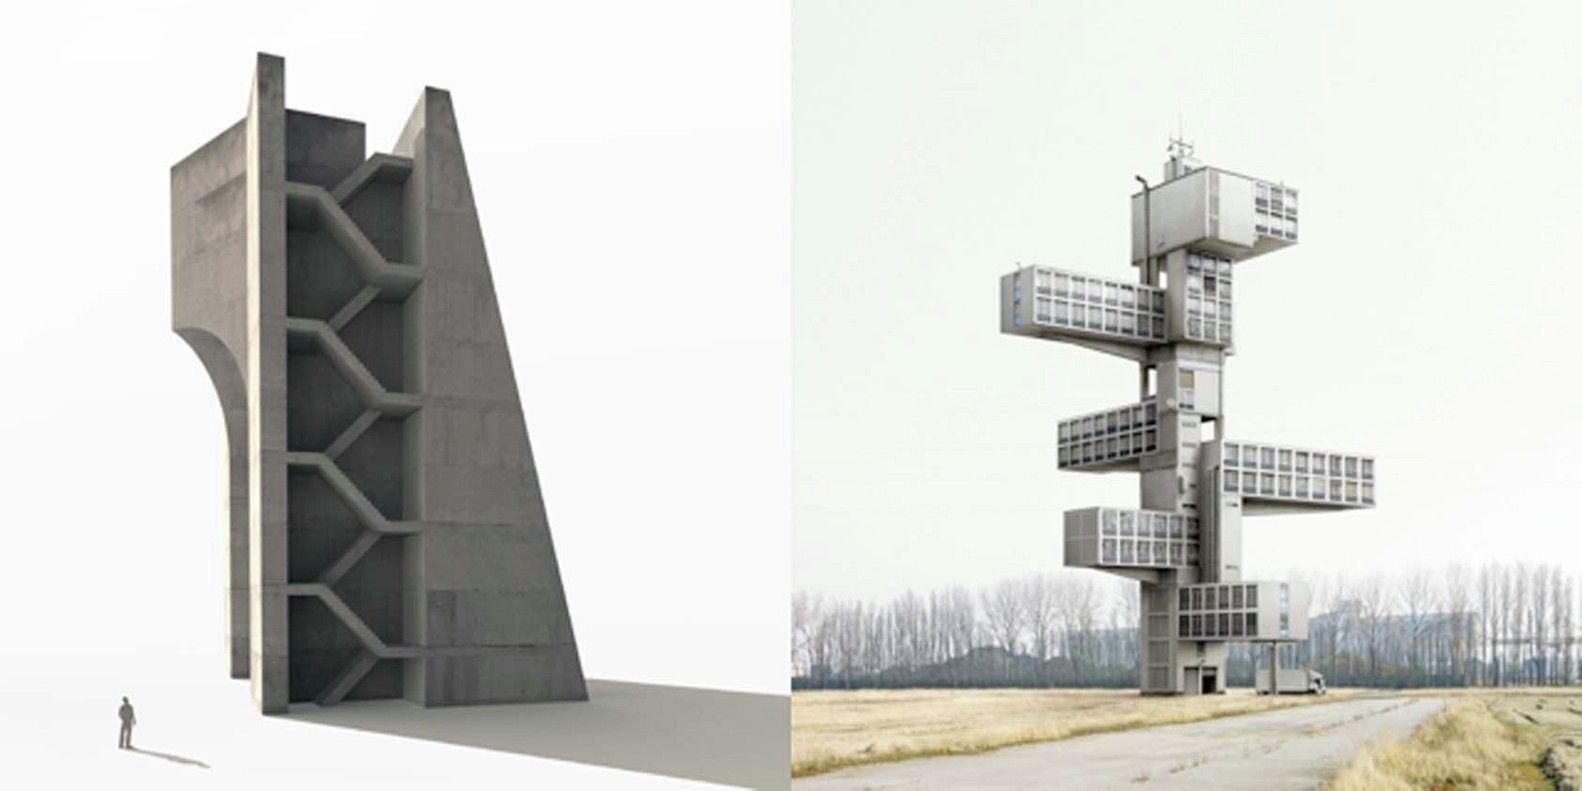 Gallery of Highlight Gallery: Filip Dujardin & Renato Nicolodi - 1